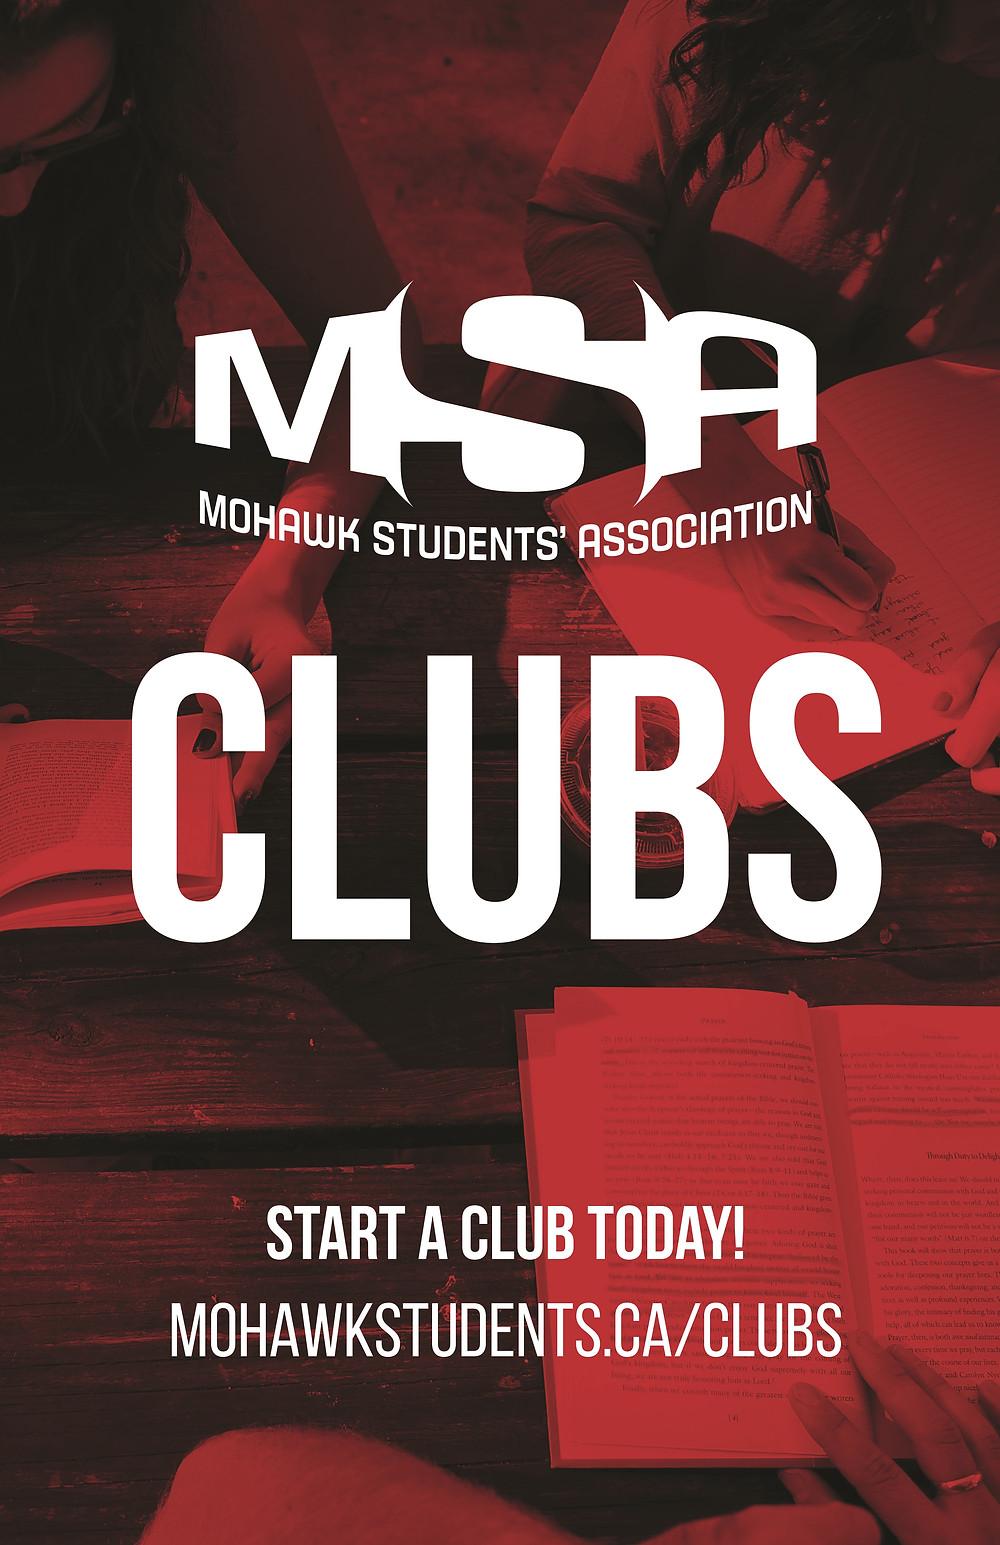 The MSA clubs logo.